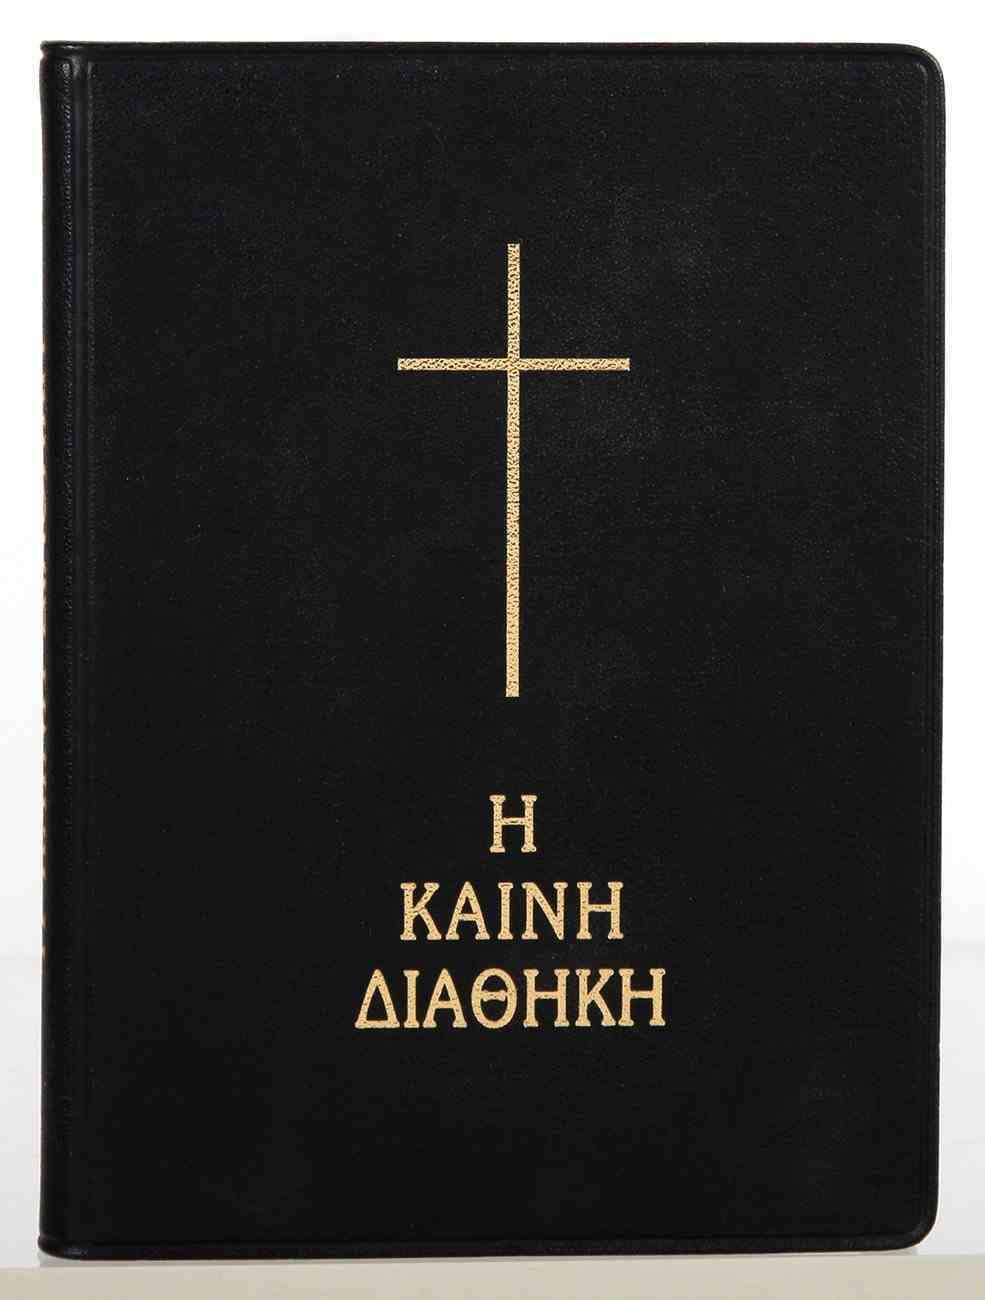 Greek New Testament Tgv Pocket Vinyl